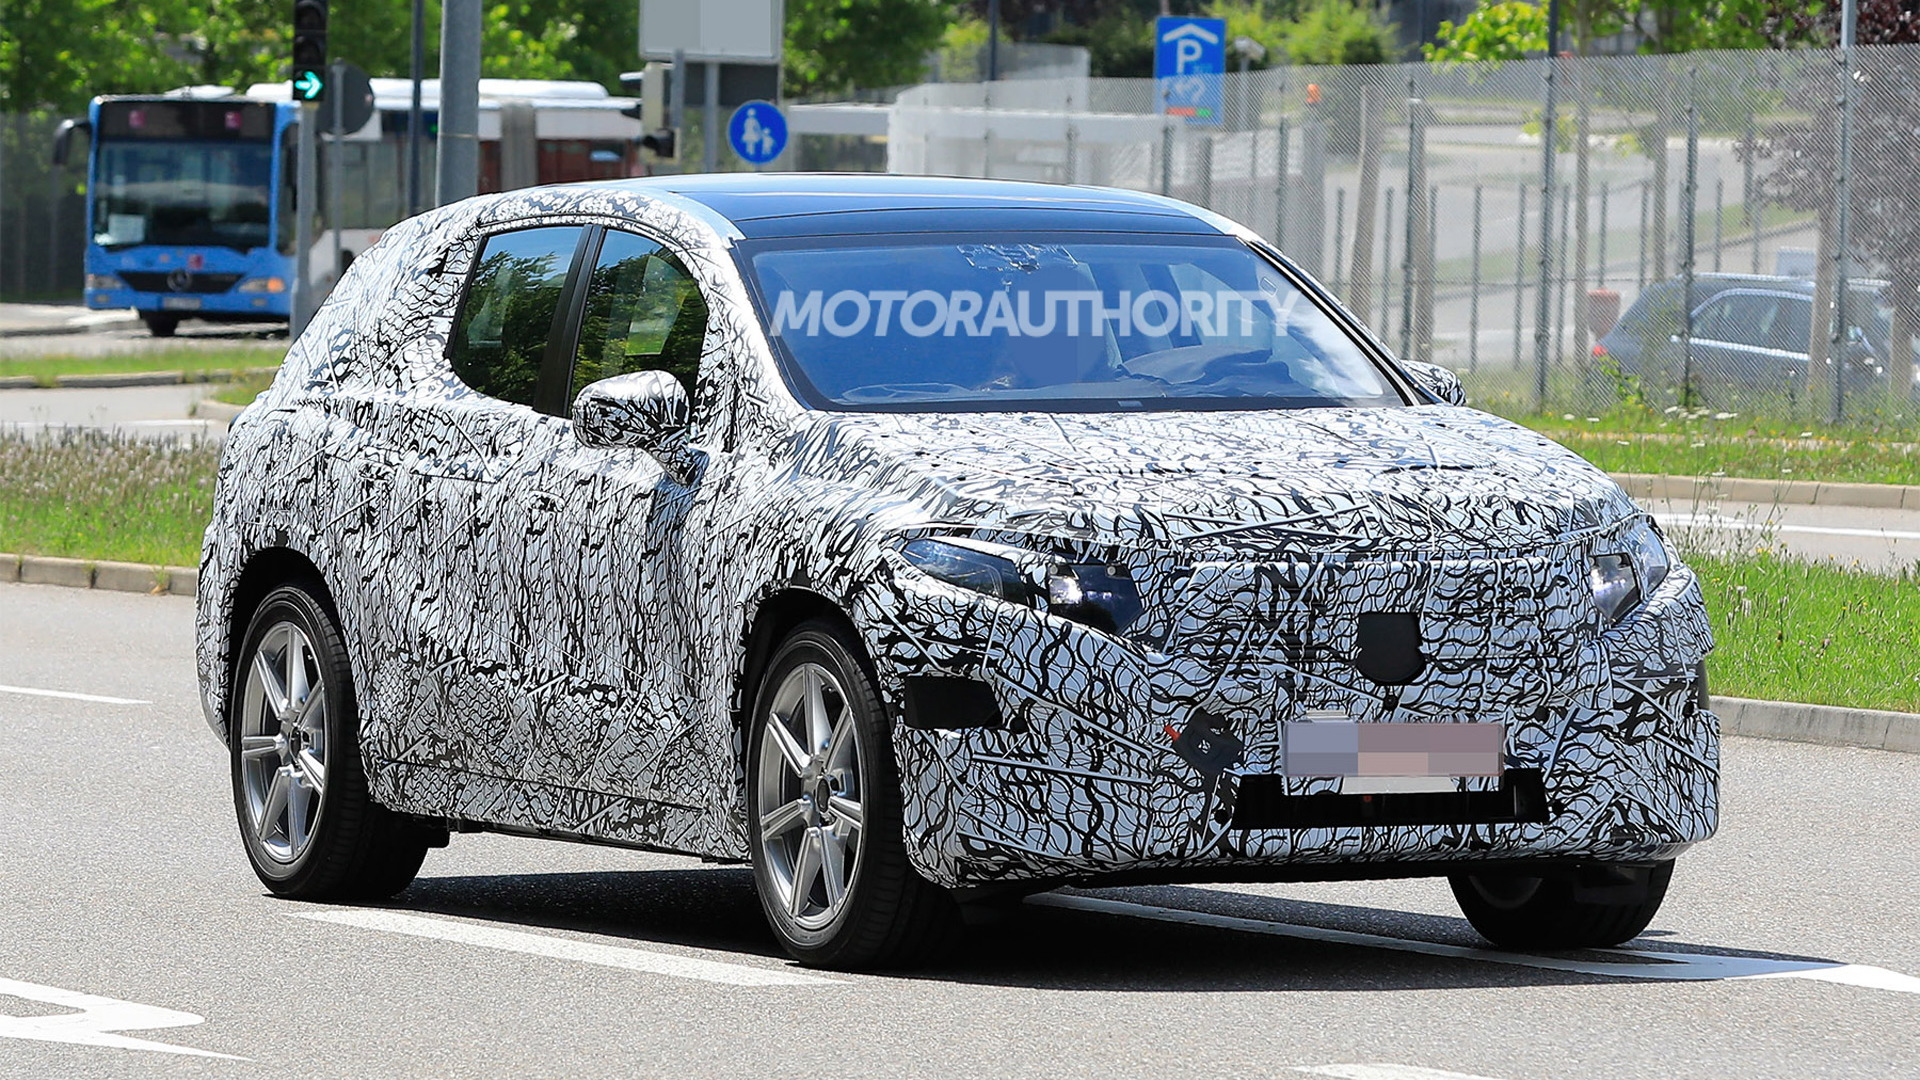 2022 Mercedes-Benz EQE SUV spy shots - Photo credit:S. Baldauf/SB-Medien